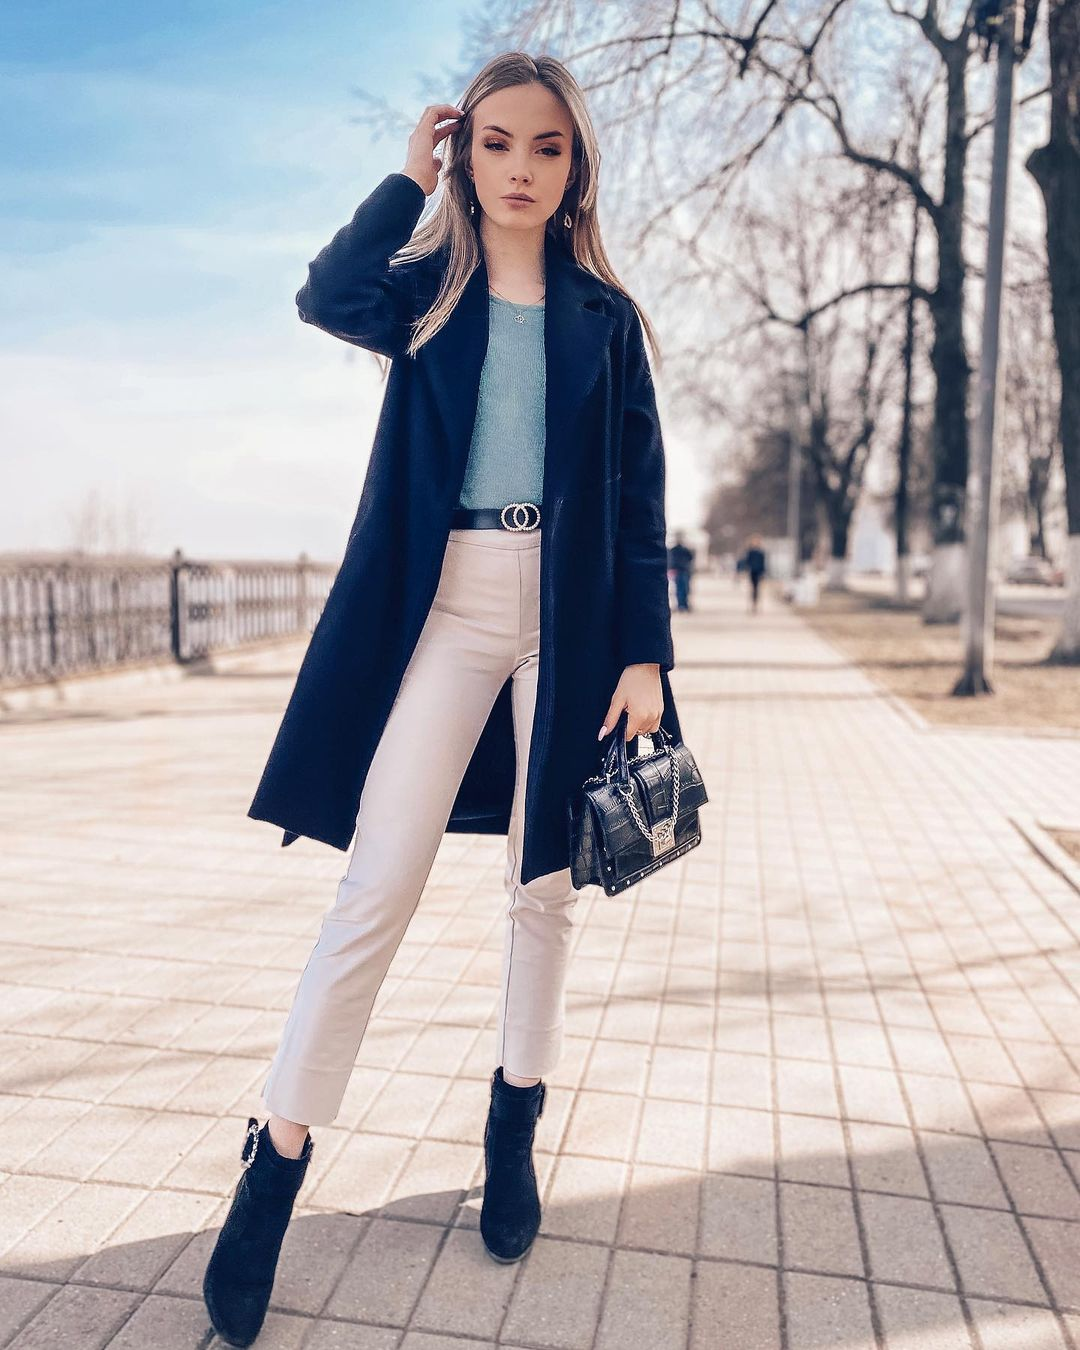 Anastasia-Fefilova-Wallpapers-Insta-Fit-Bio-3